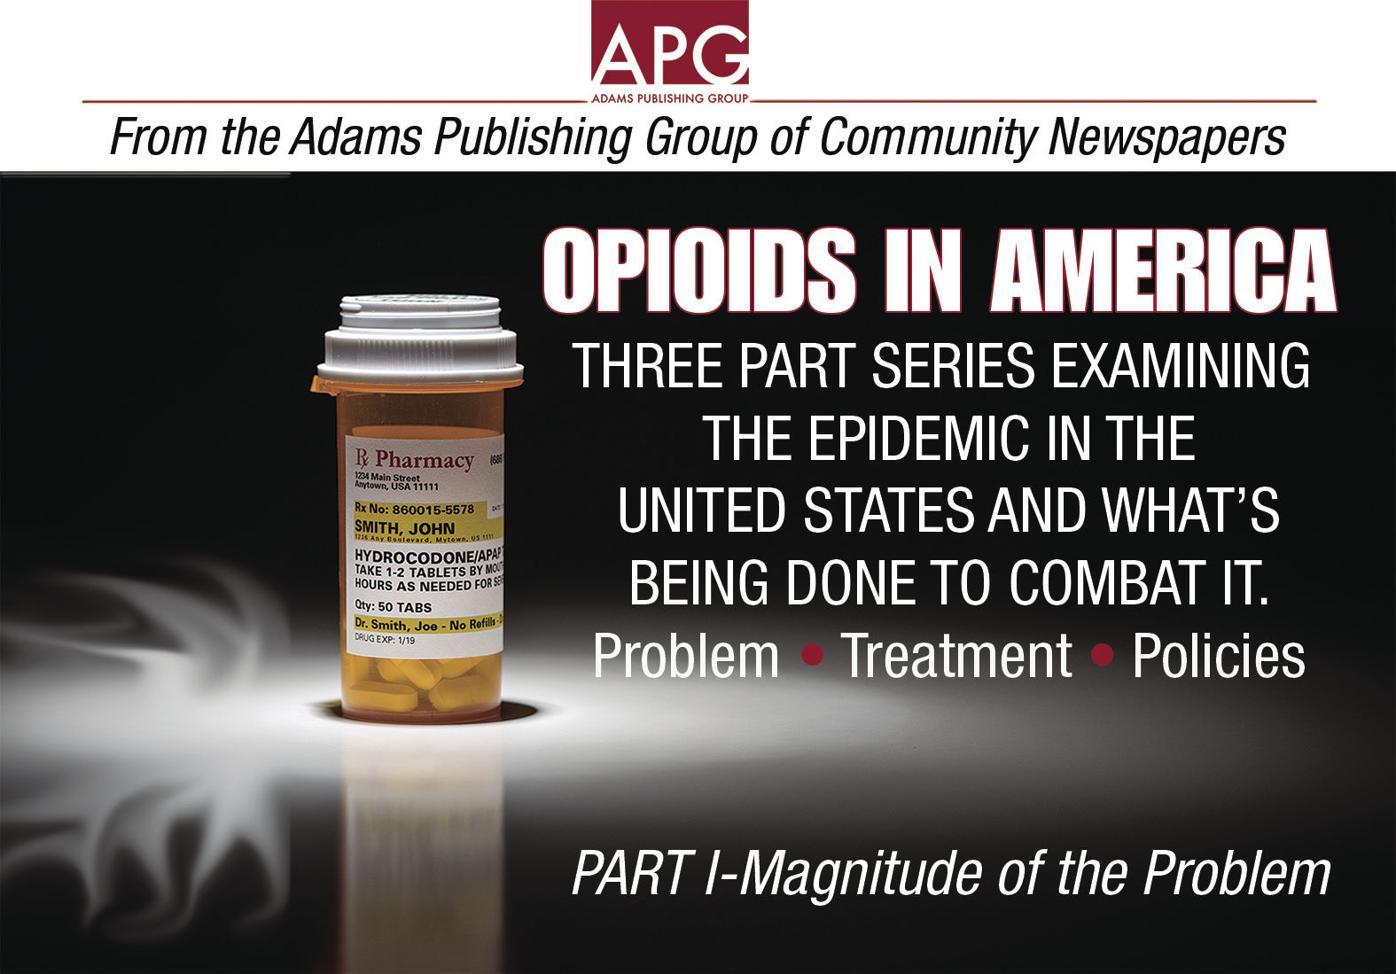 Opioids in America series tag part 1